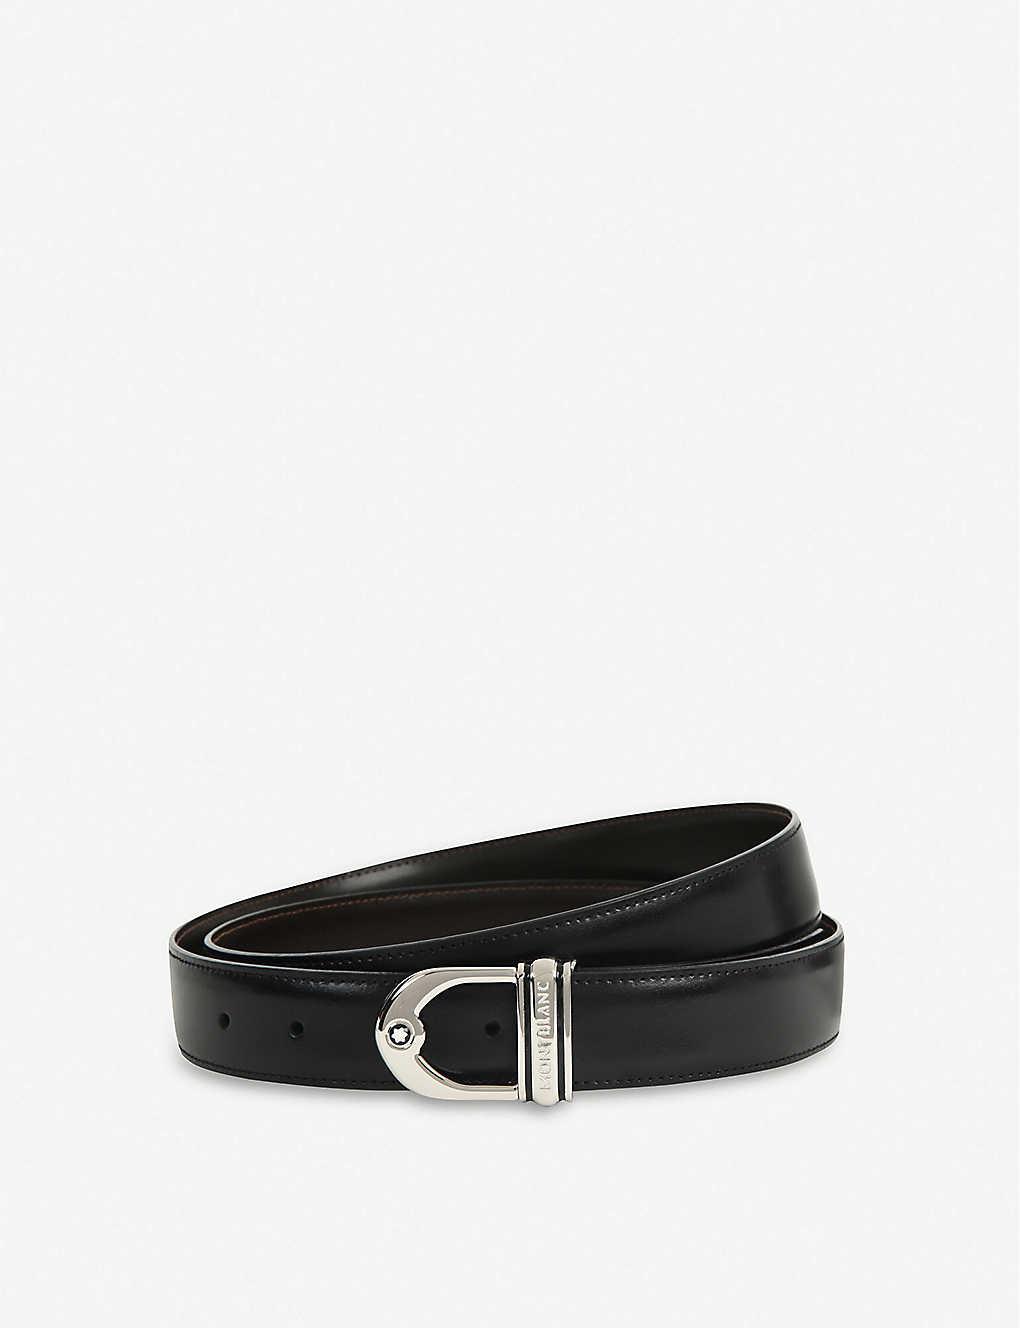 5bd6e3fc7fe Reversible logo-detailed leather belt - Black brown ...